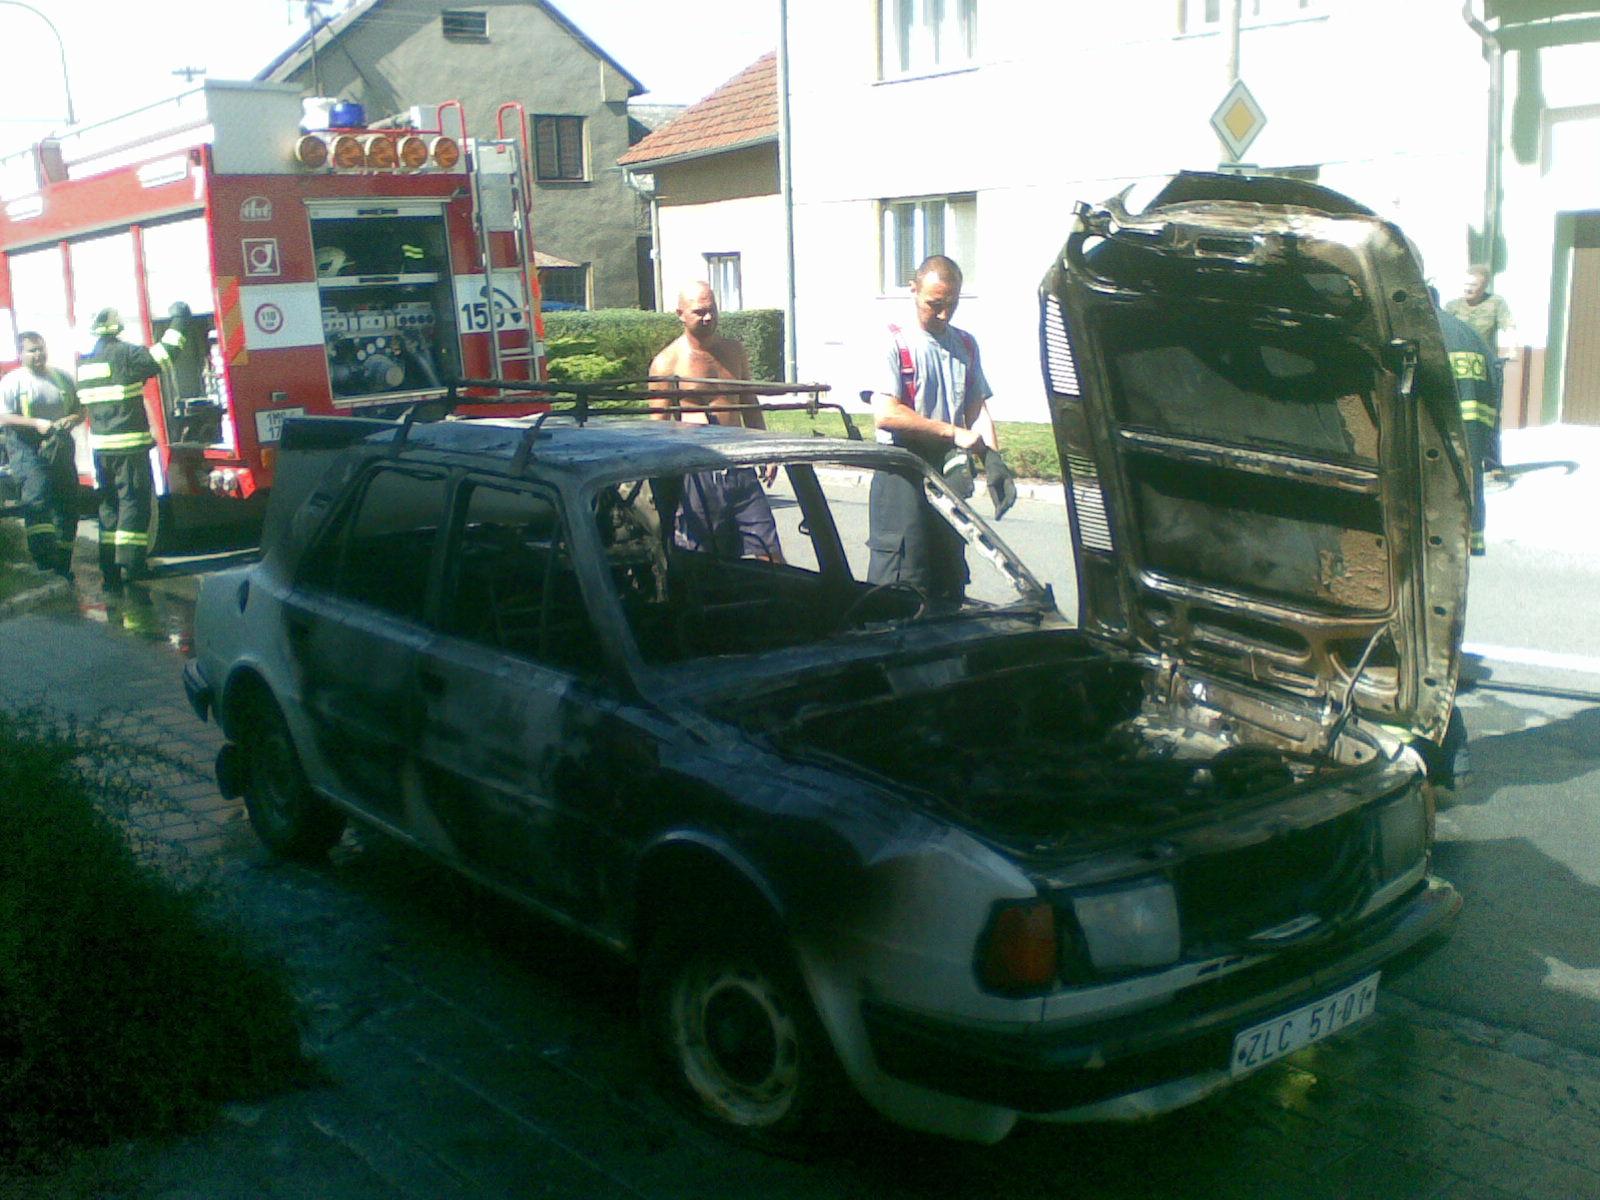 2009-09-01-požár auta Týnecká Grygov-04